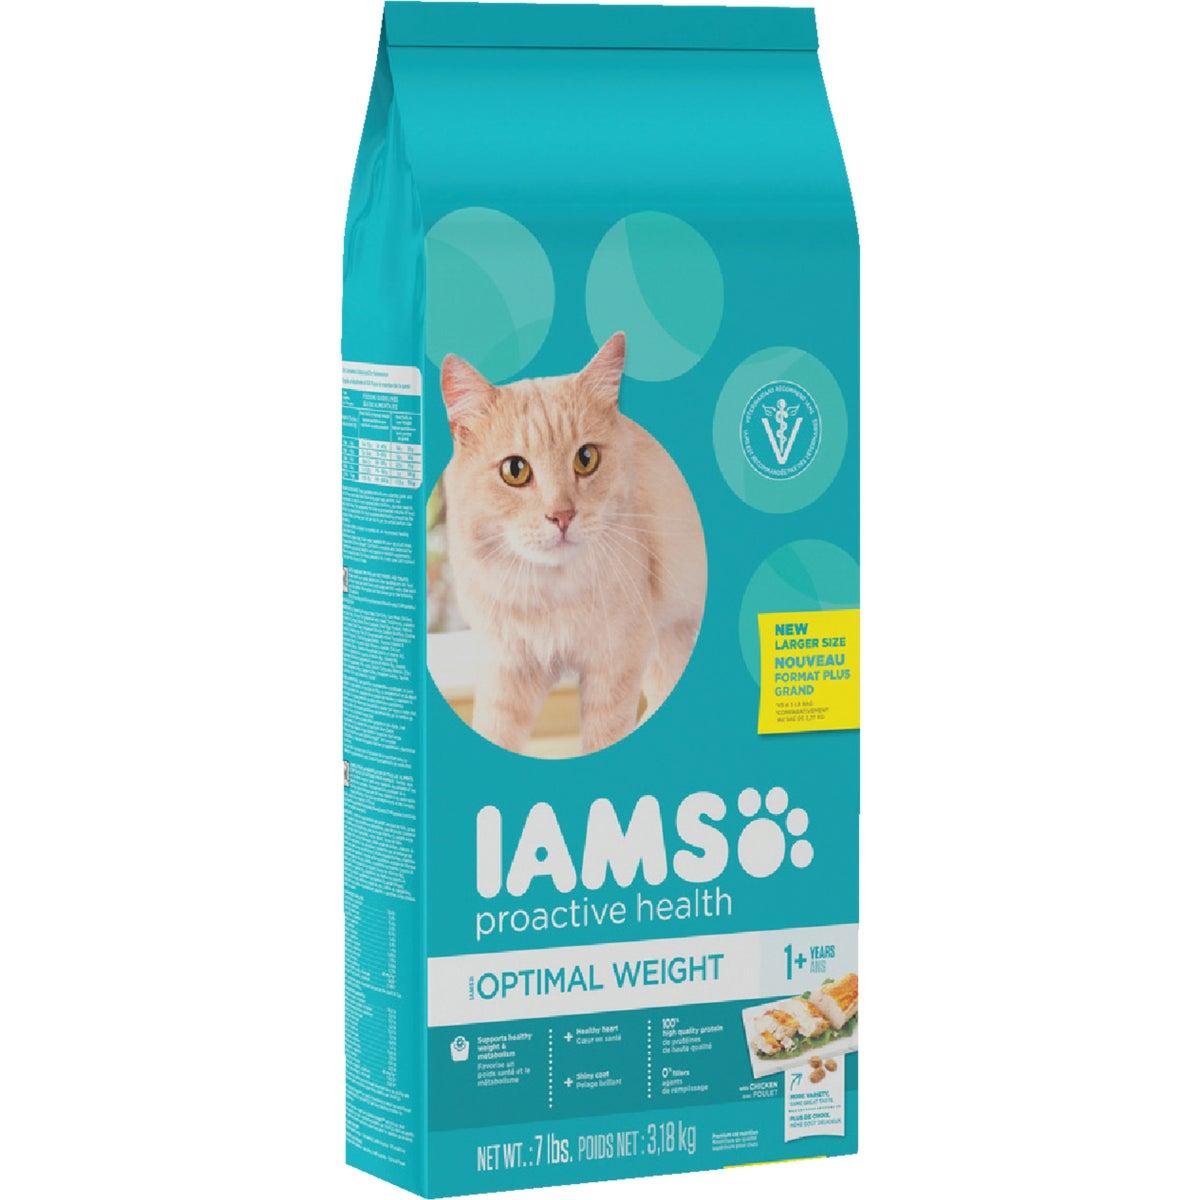 5LB WGHTCNTRL CAT FOOD